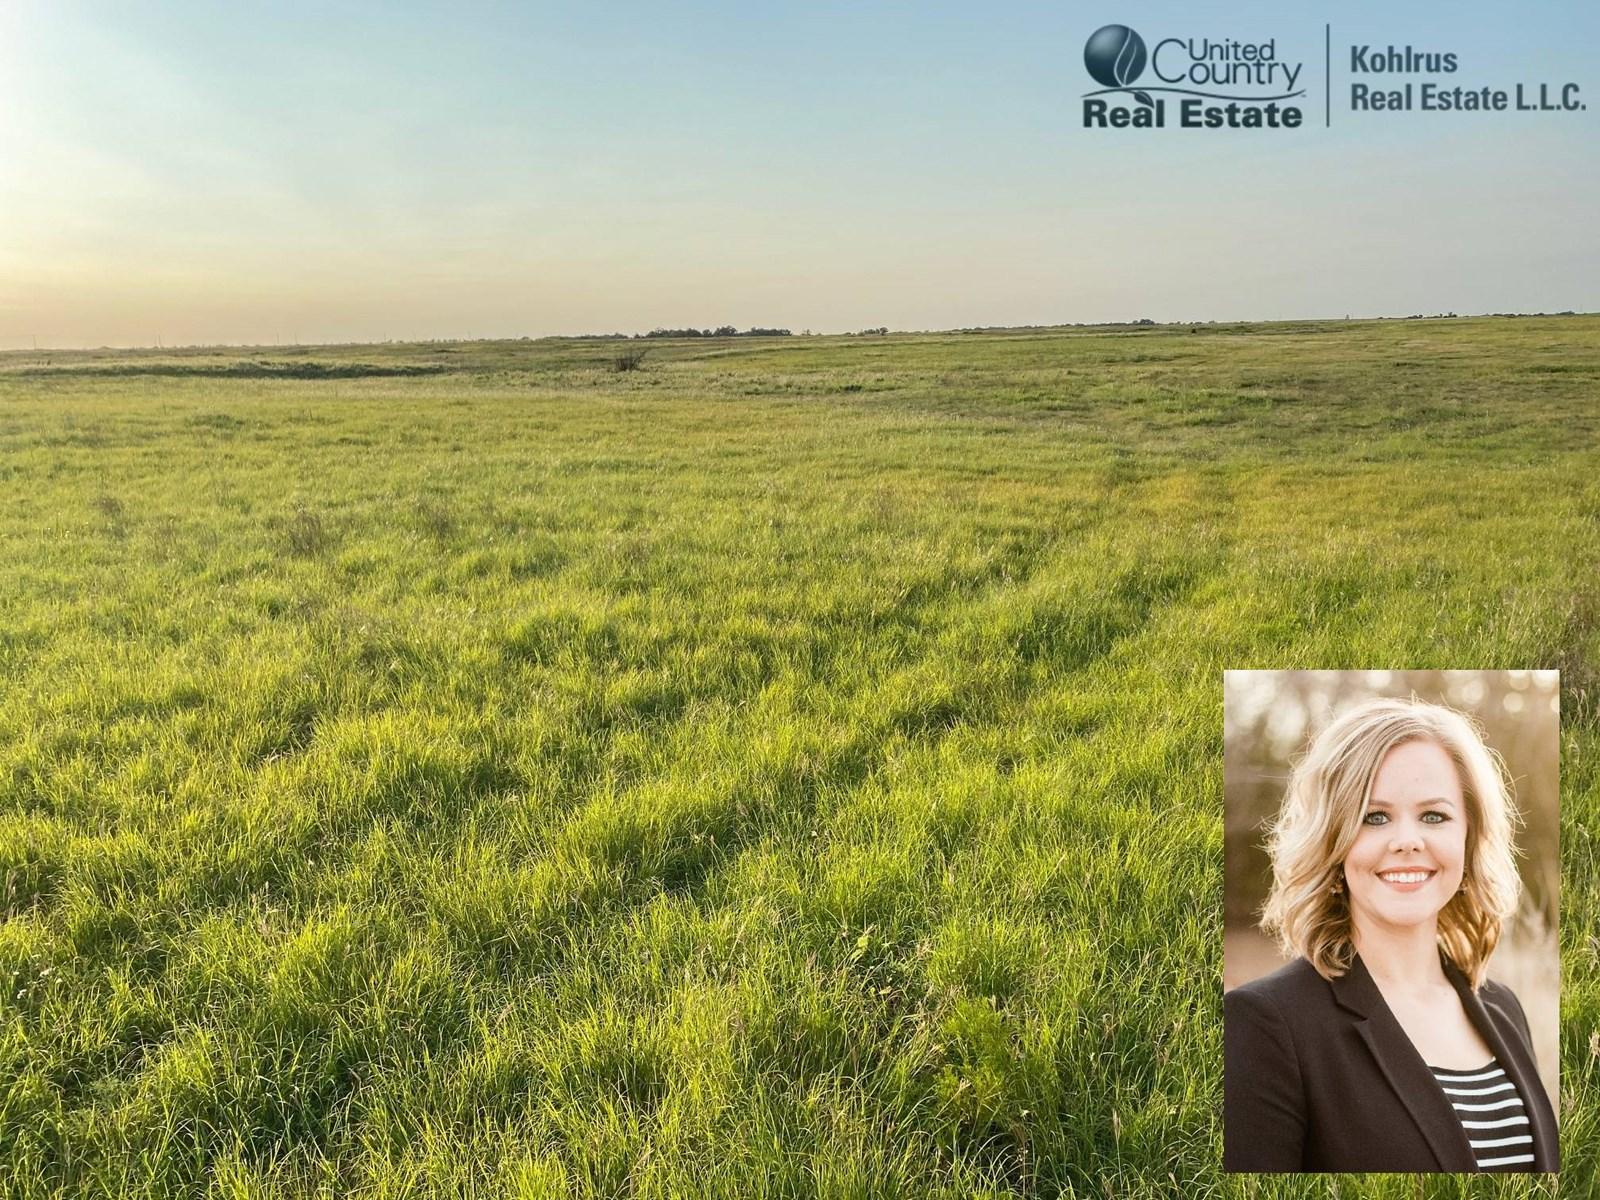 Great Farmland Pasture in Wakita, OK Grant County - Hunting